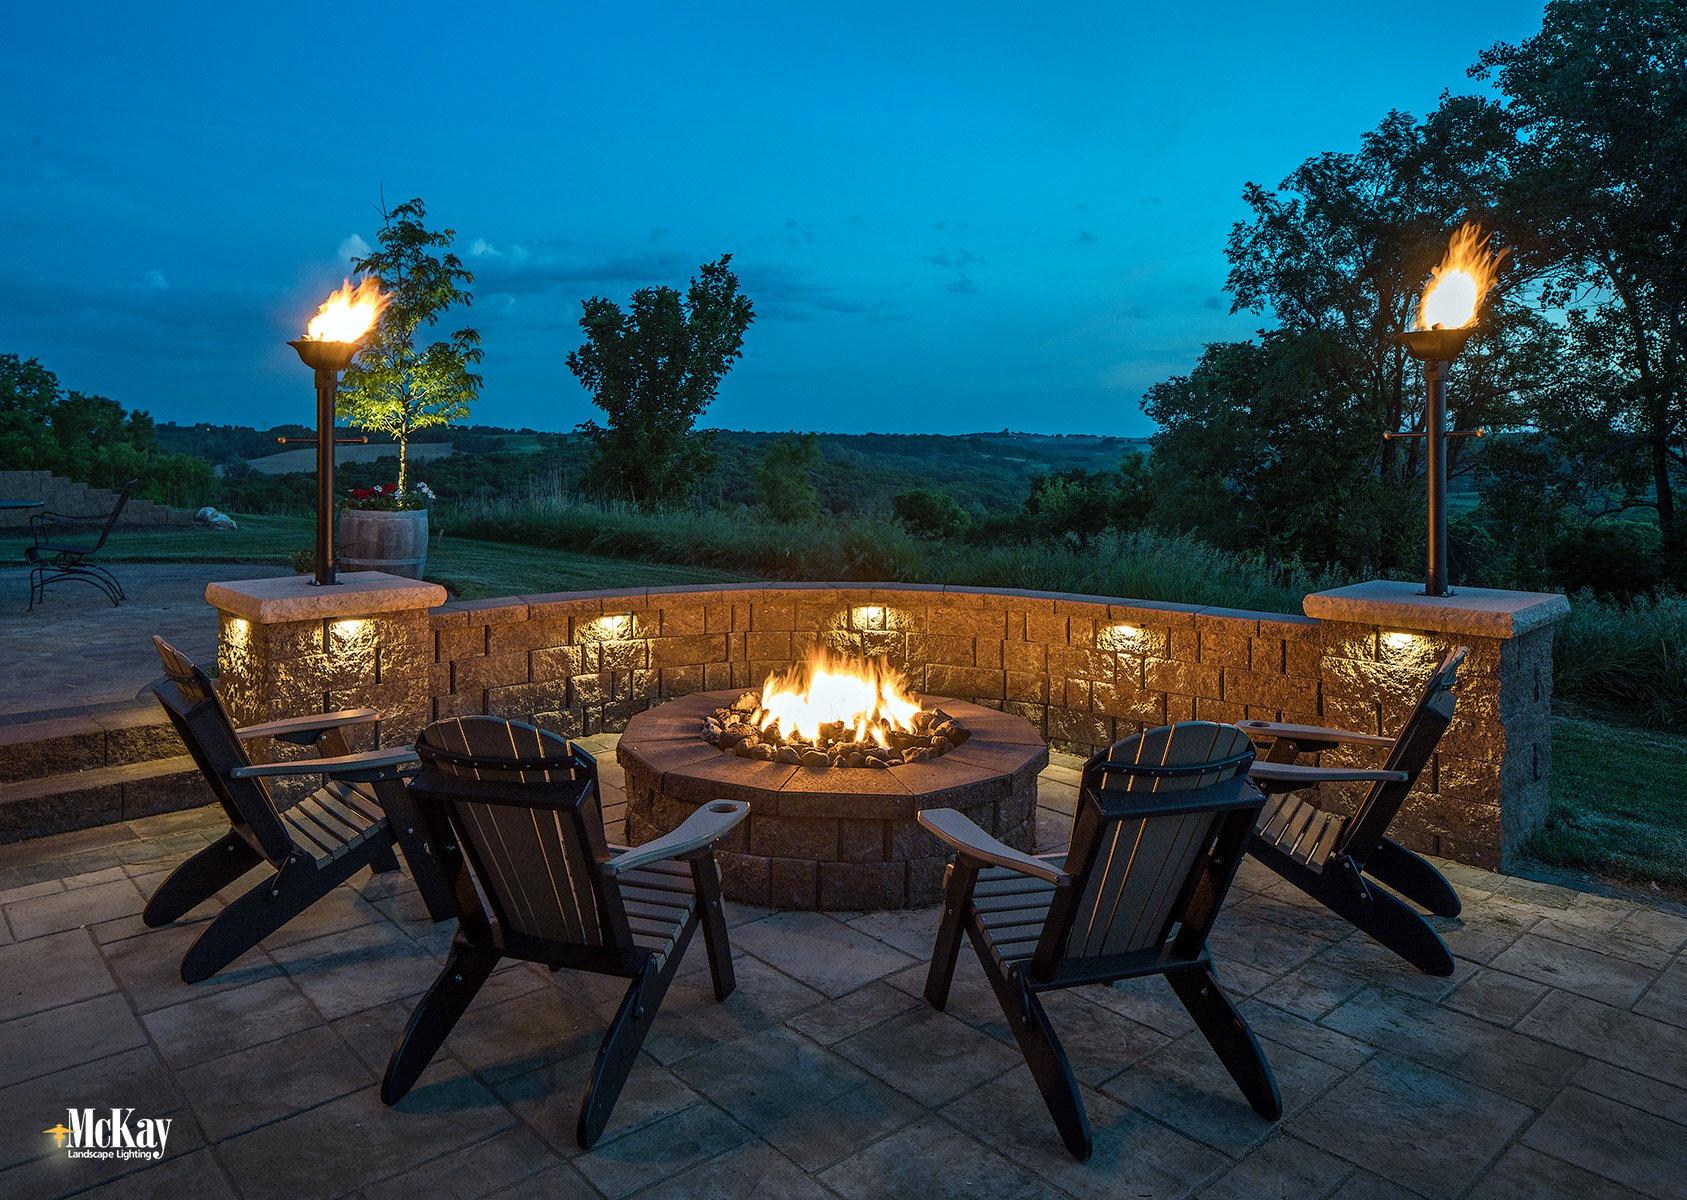 fire pit patio seat wall lighting omaha nebraska McKay Landscape Lighting B 03